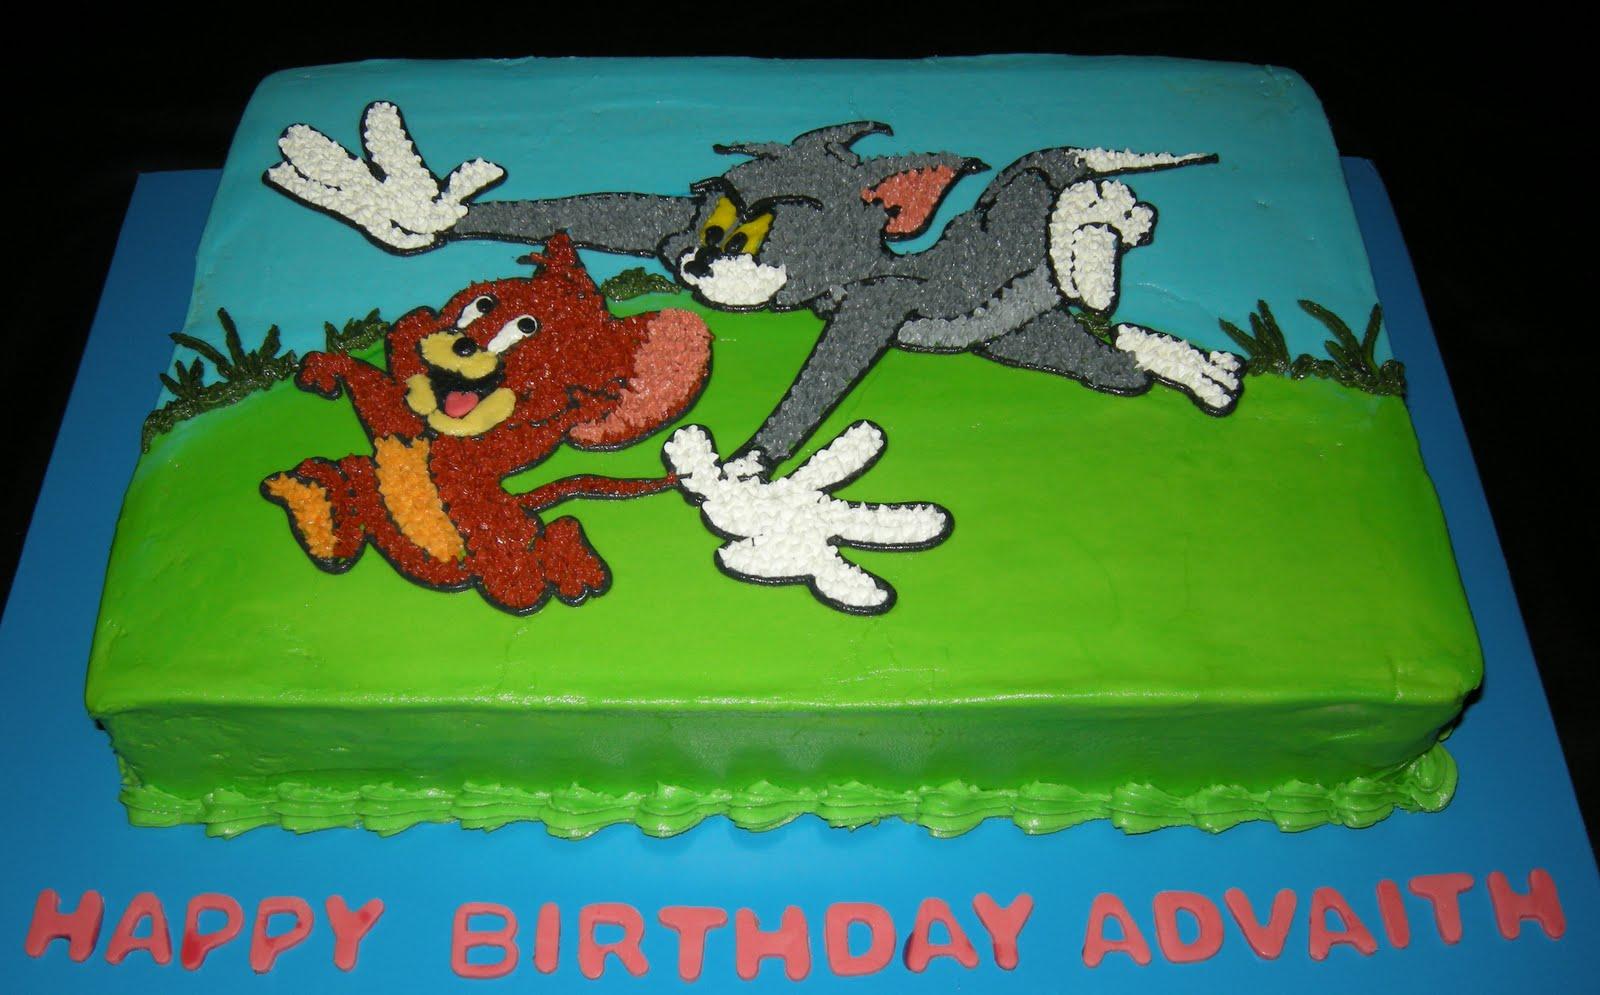 Harshi S Cakes Amp Bakes Tom Amp Jerry 2